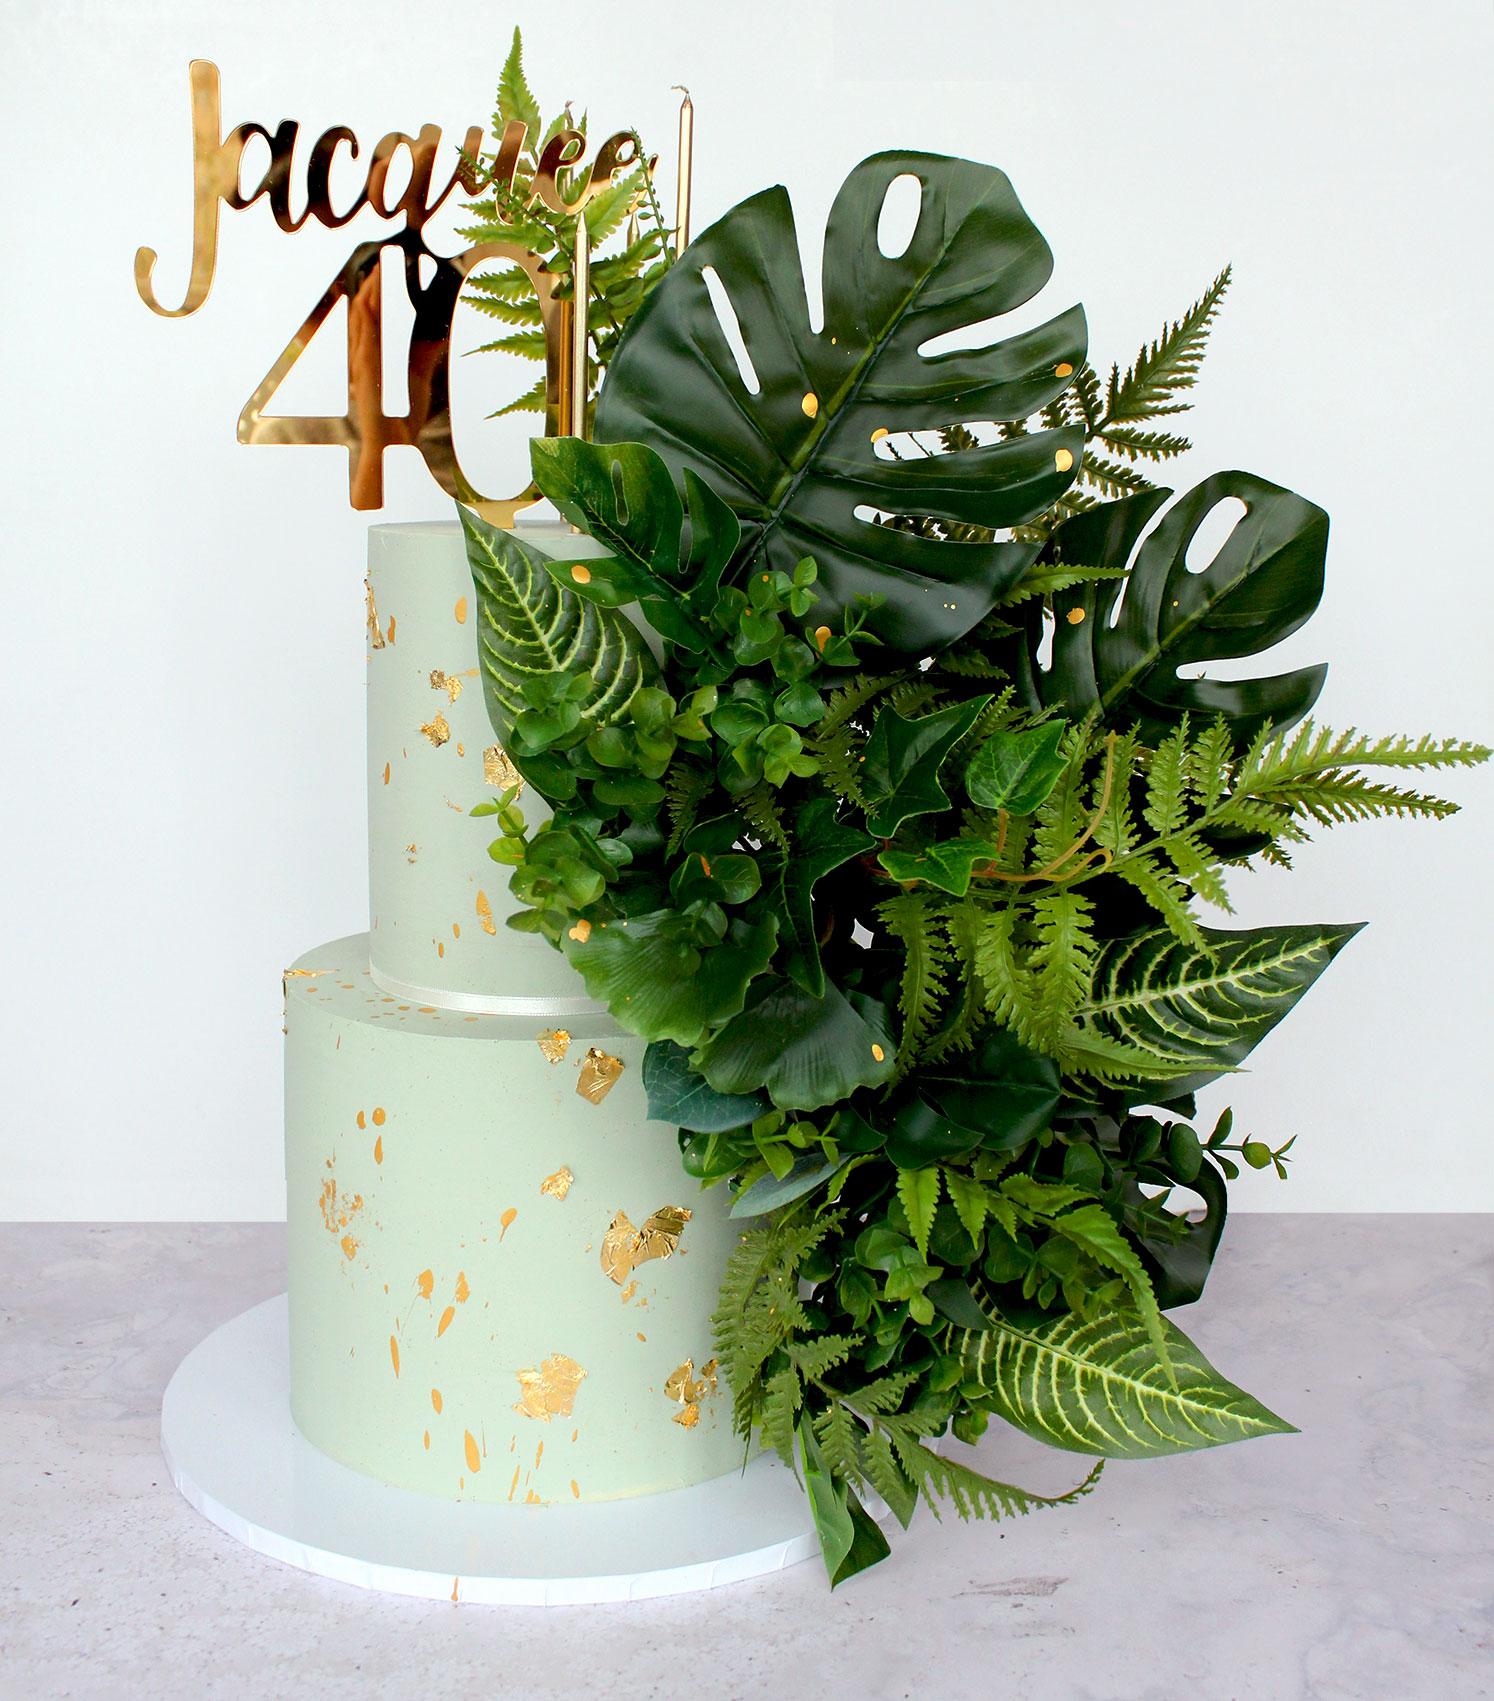 2 Tier Pale Green Oversized Foliage Celebration Cake